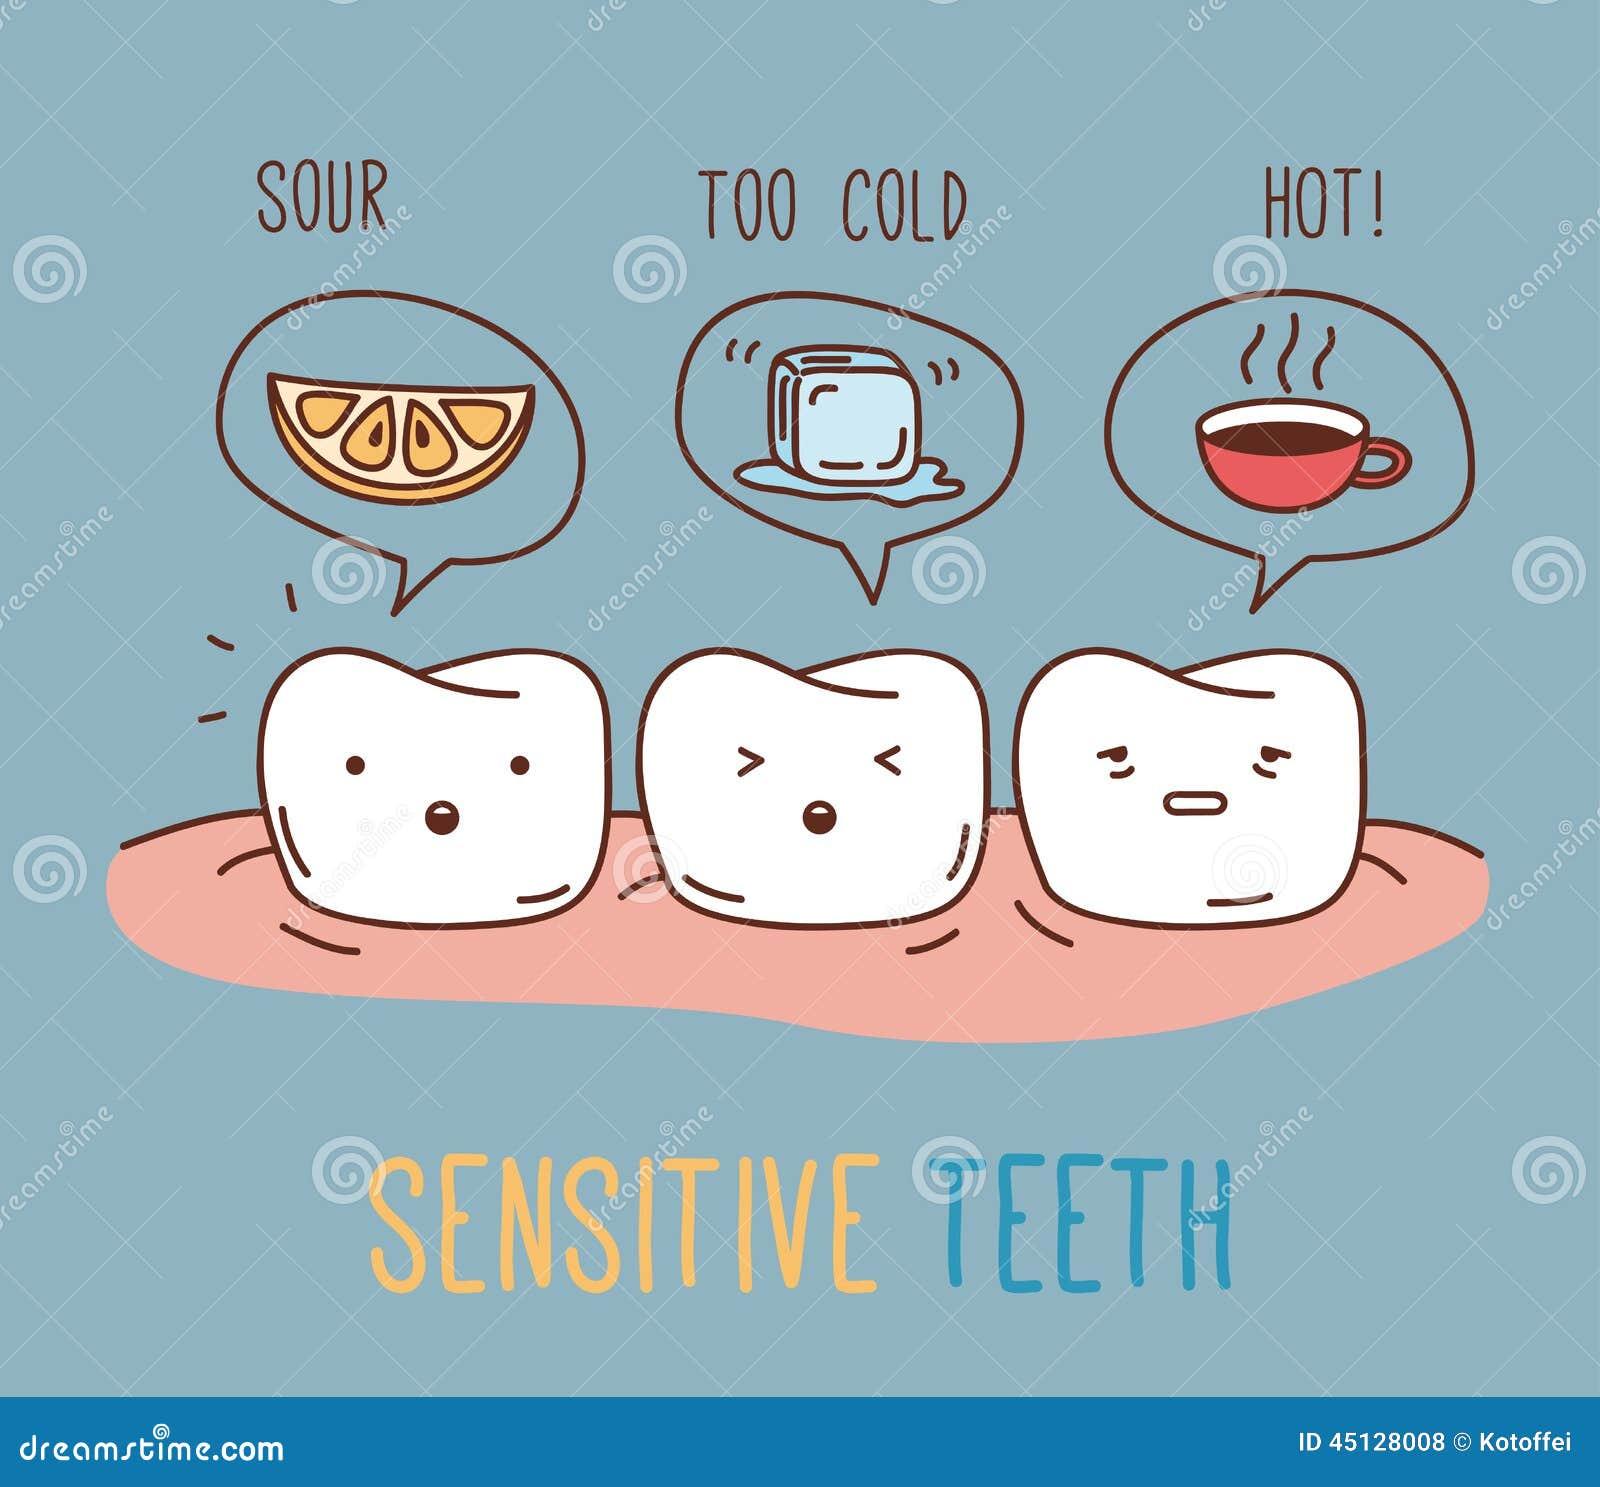 Cute Cartoon Dental Tool Set Stock Vector Auto Electrical Wiring Heat York Diagram Pump 063 84793c Comics About Sensitive Teeth